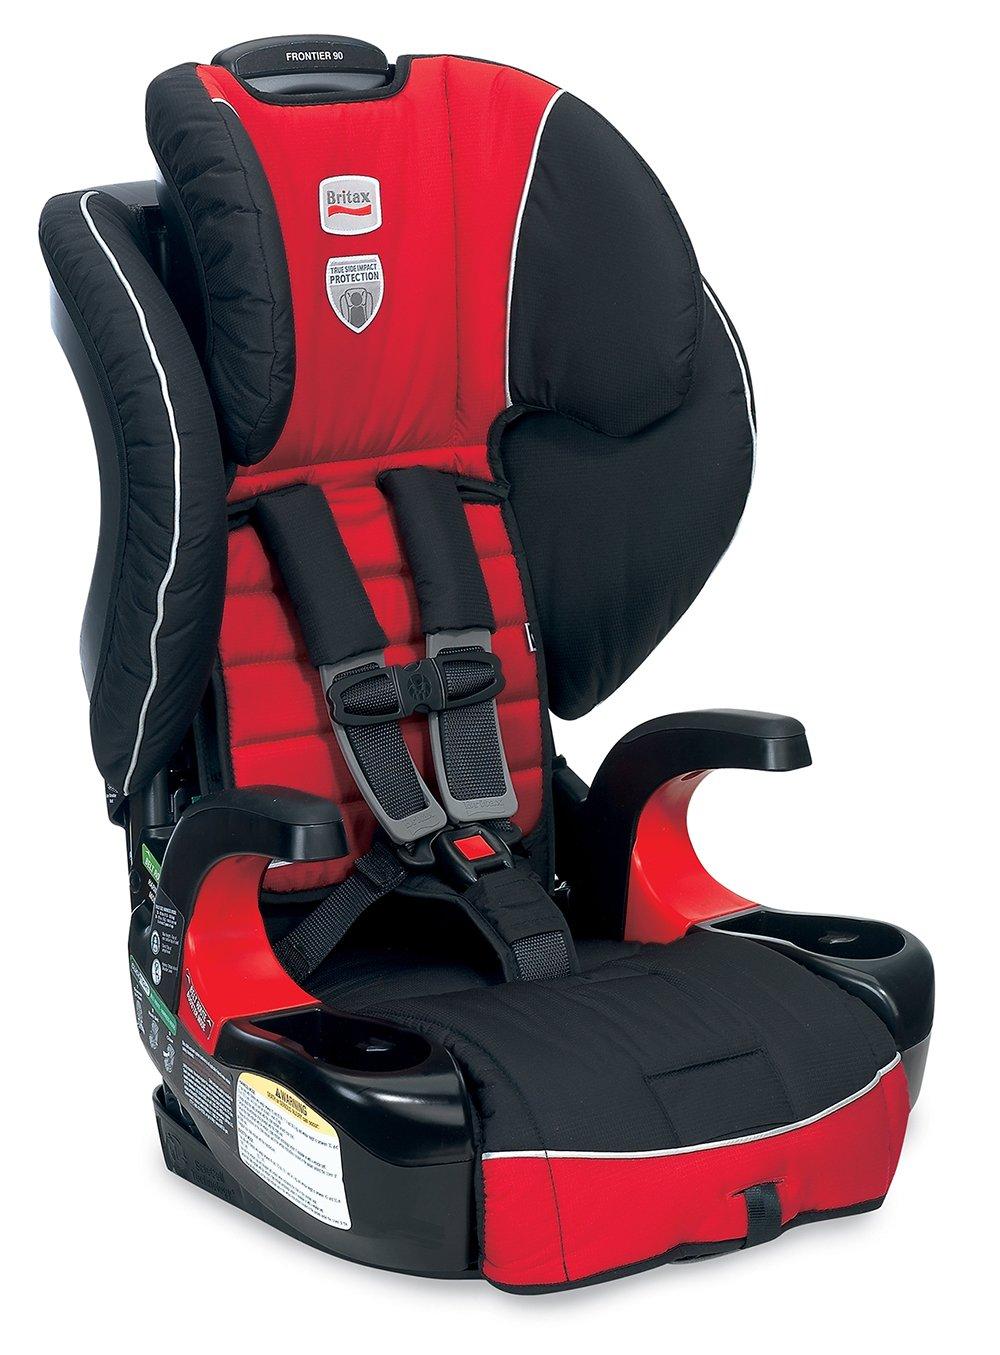 amazon com britax frontier 90 booster car seat congo prior model rh amazon com britax frontier 90 owners manual britax frontier 85 owners manual